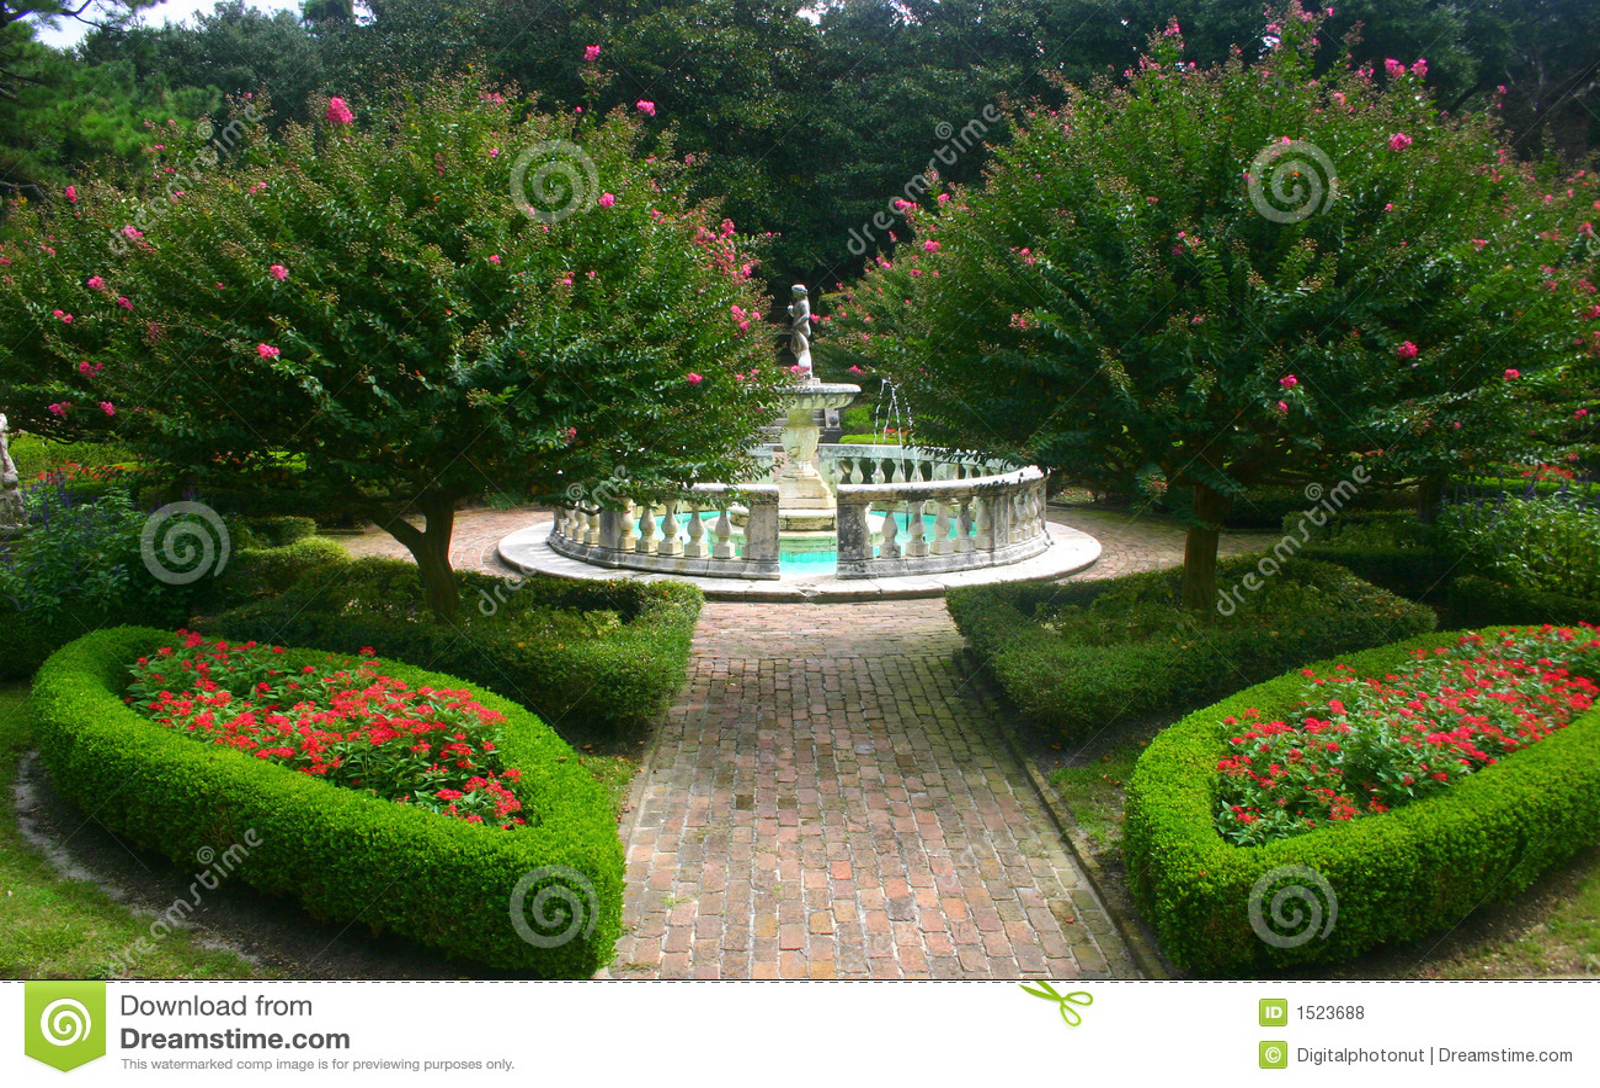 Lush Garden With Fountain Royalty Free Stock Photos